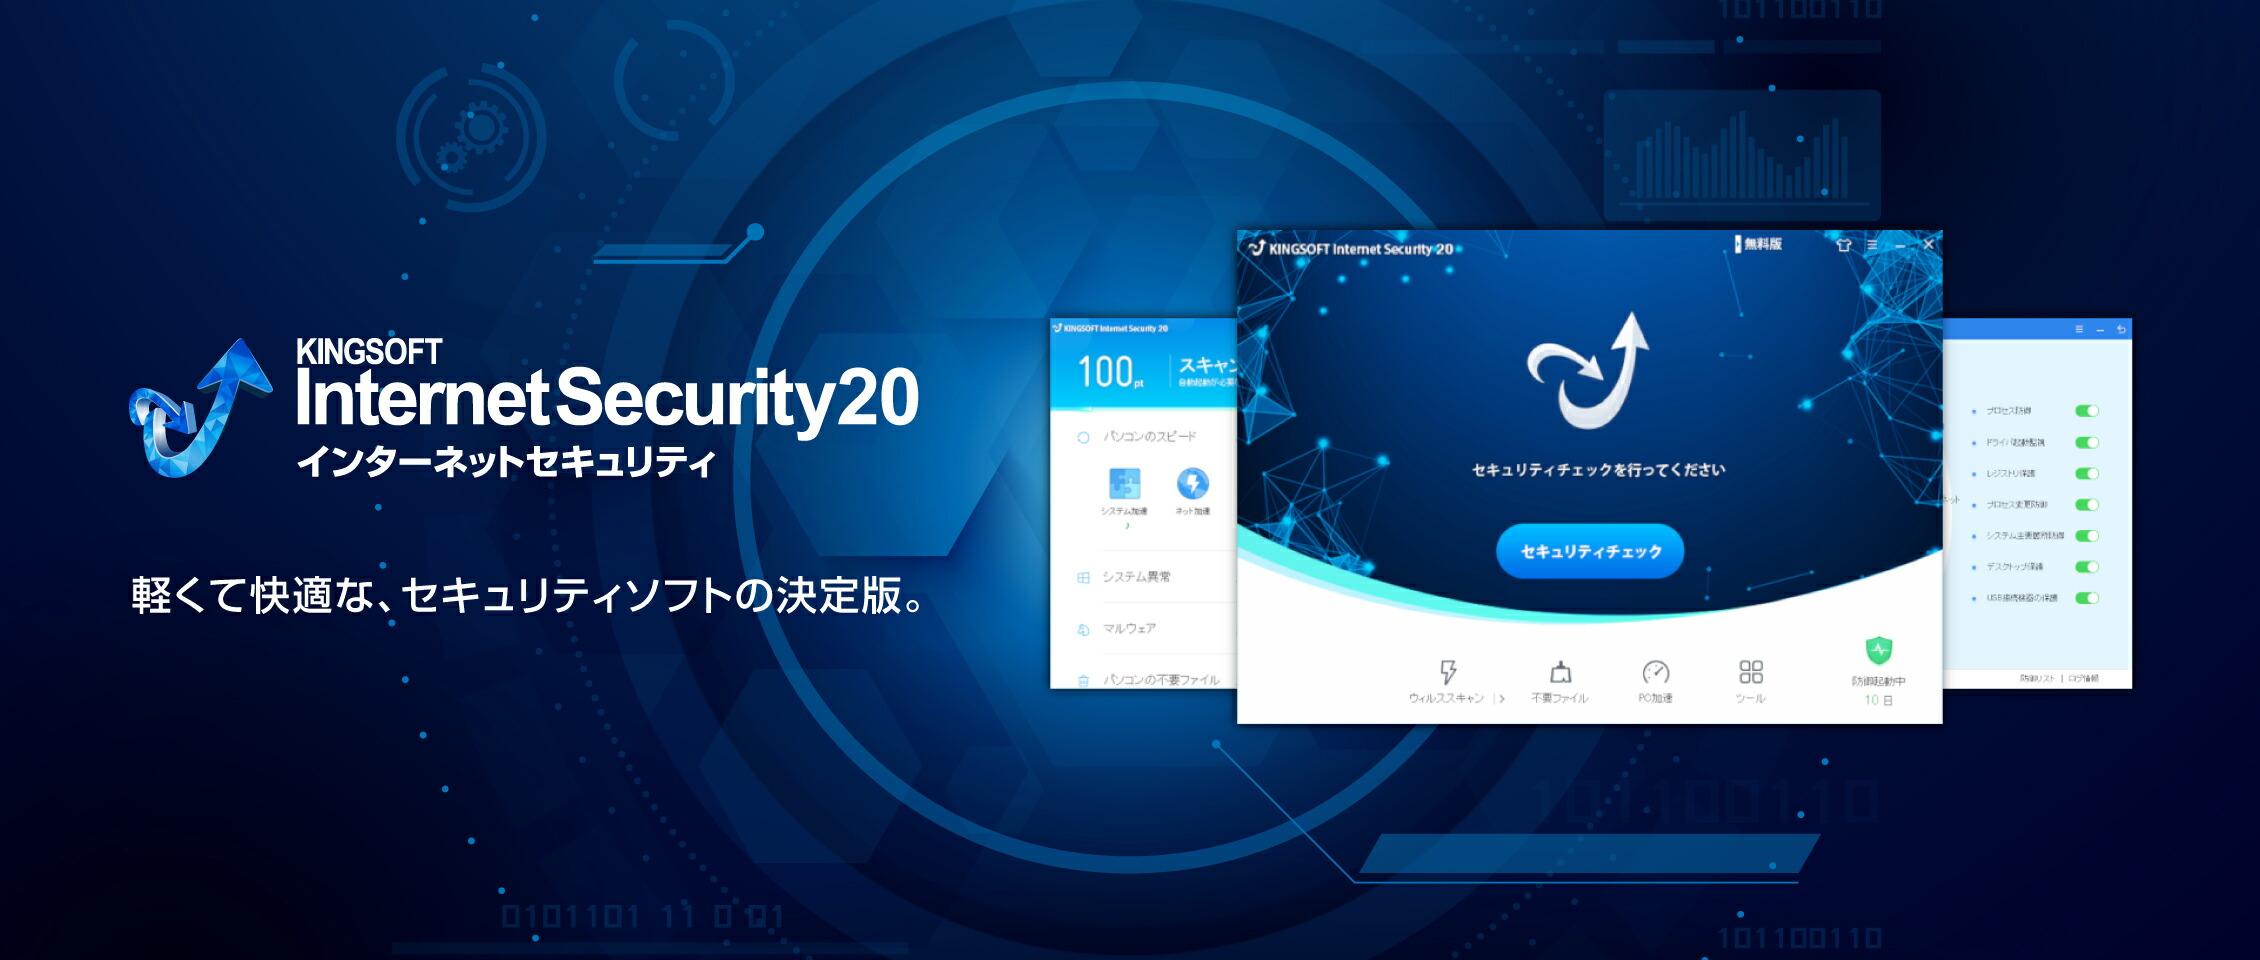 KINGSOFT Internet Security20